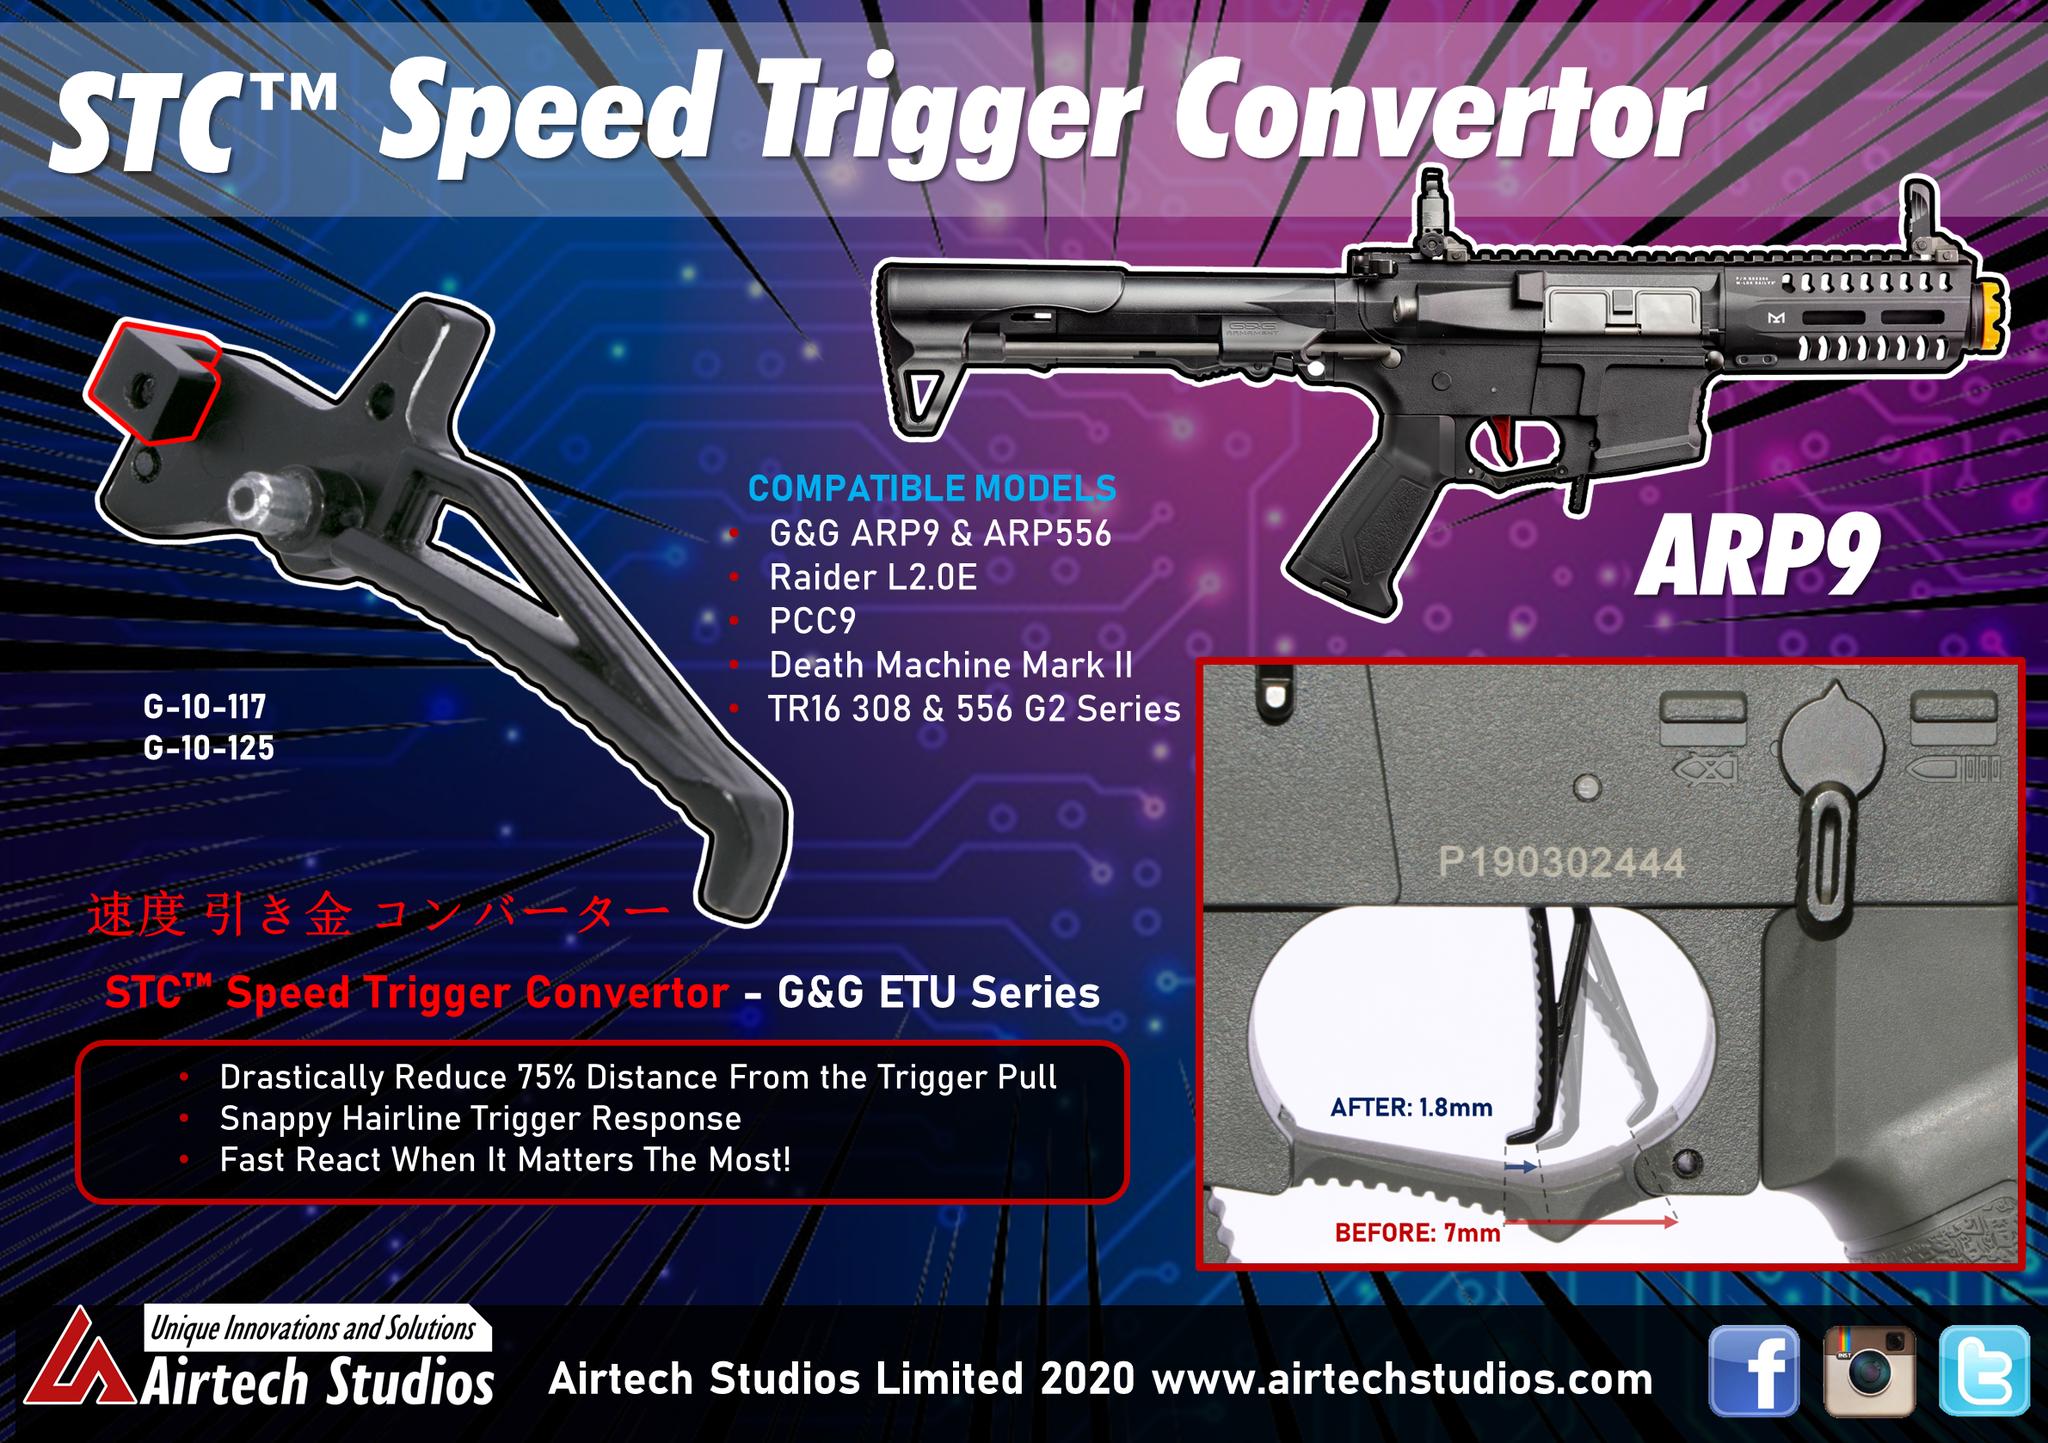 Airtech Studios STC Speed Trigger Convertor - G&G ETU Models